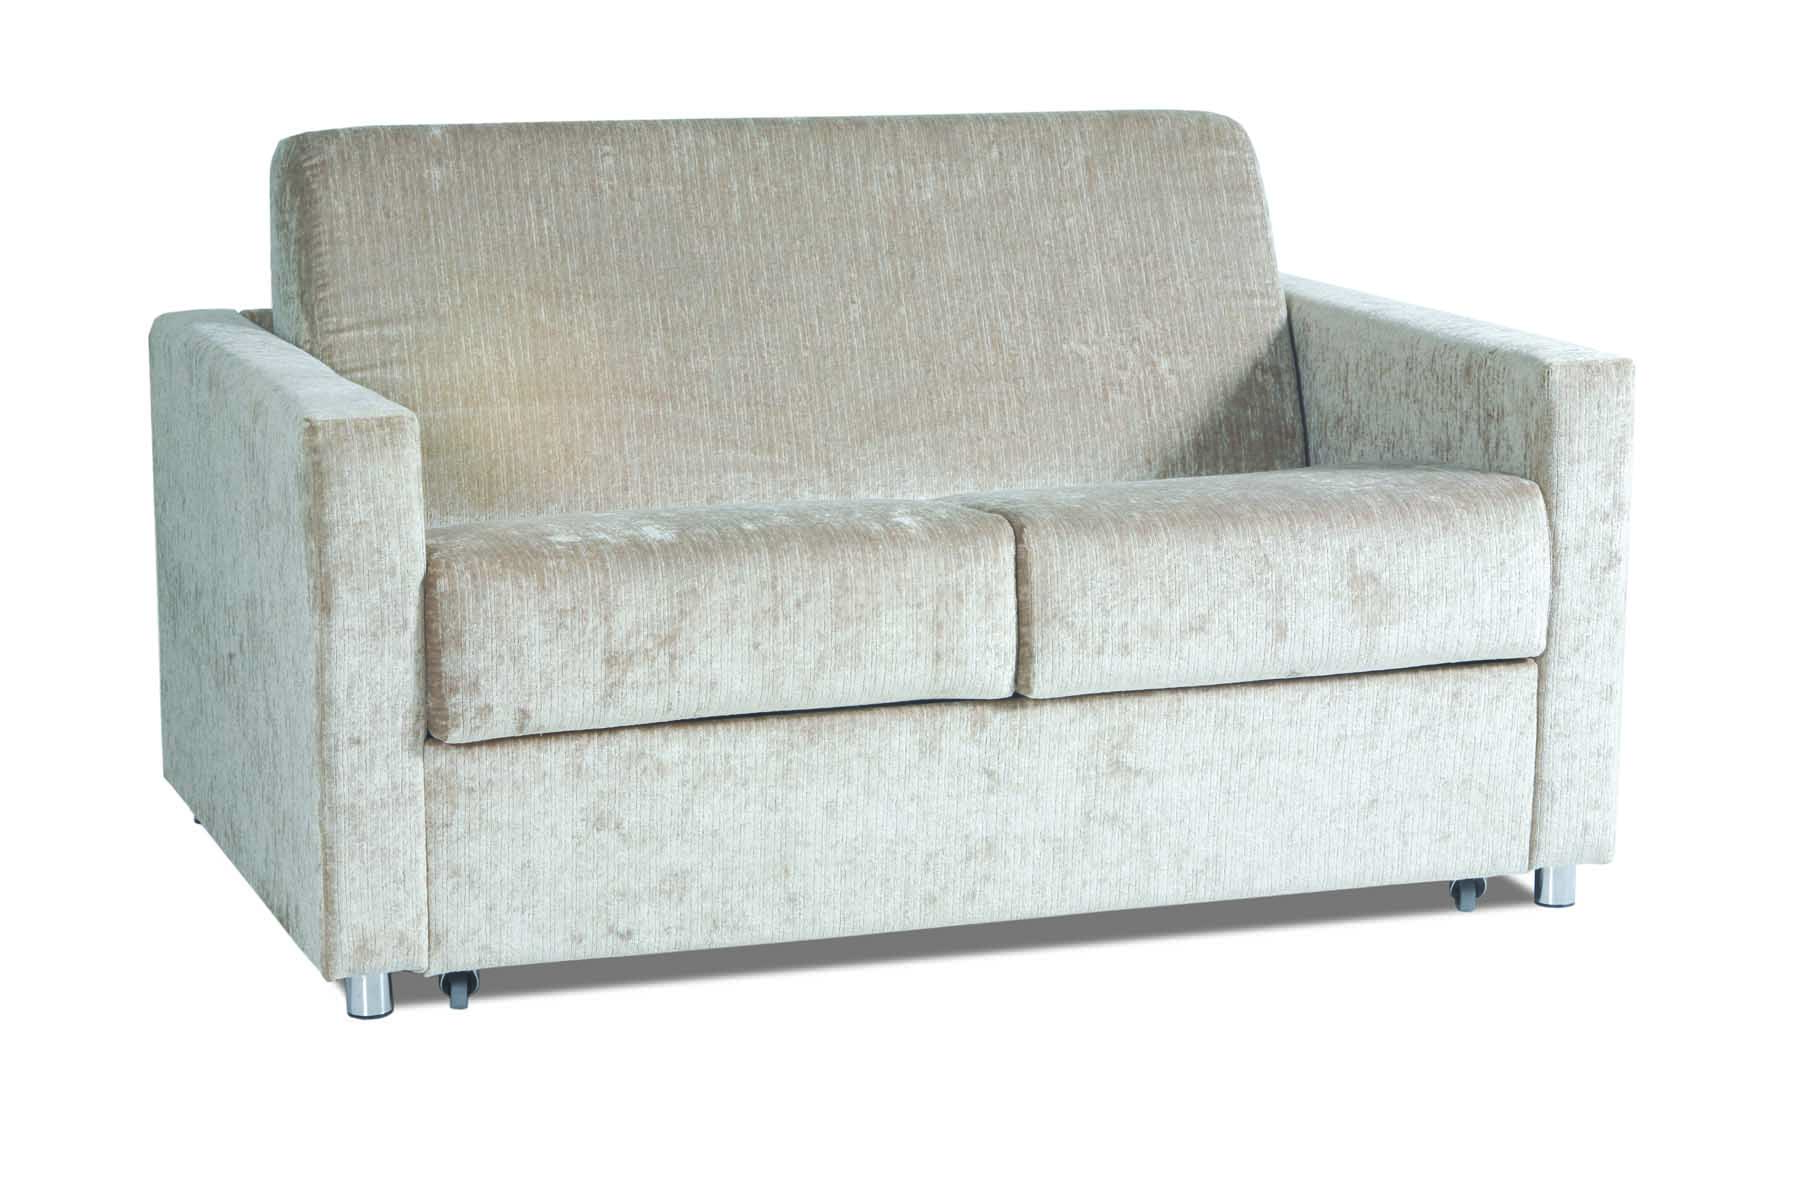 Daytona 120 Sofa Bed Jameson Seating